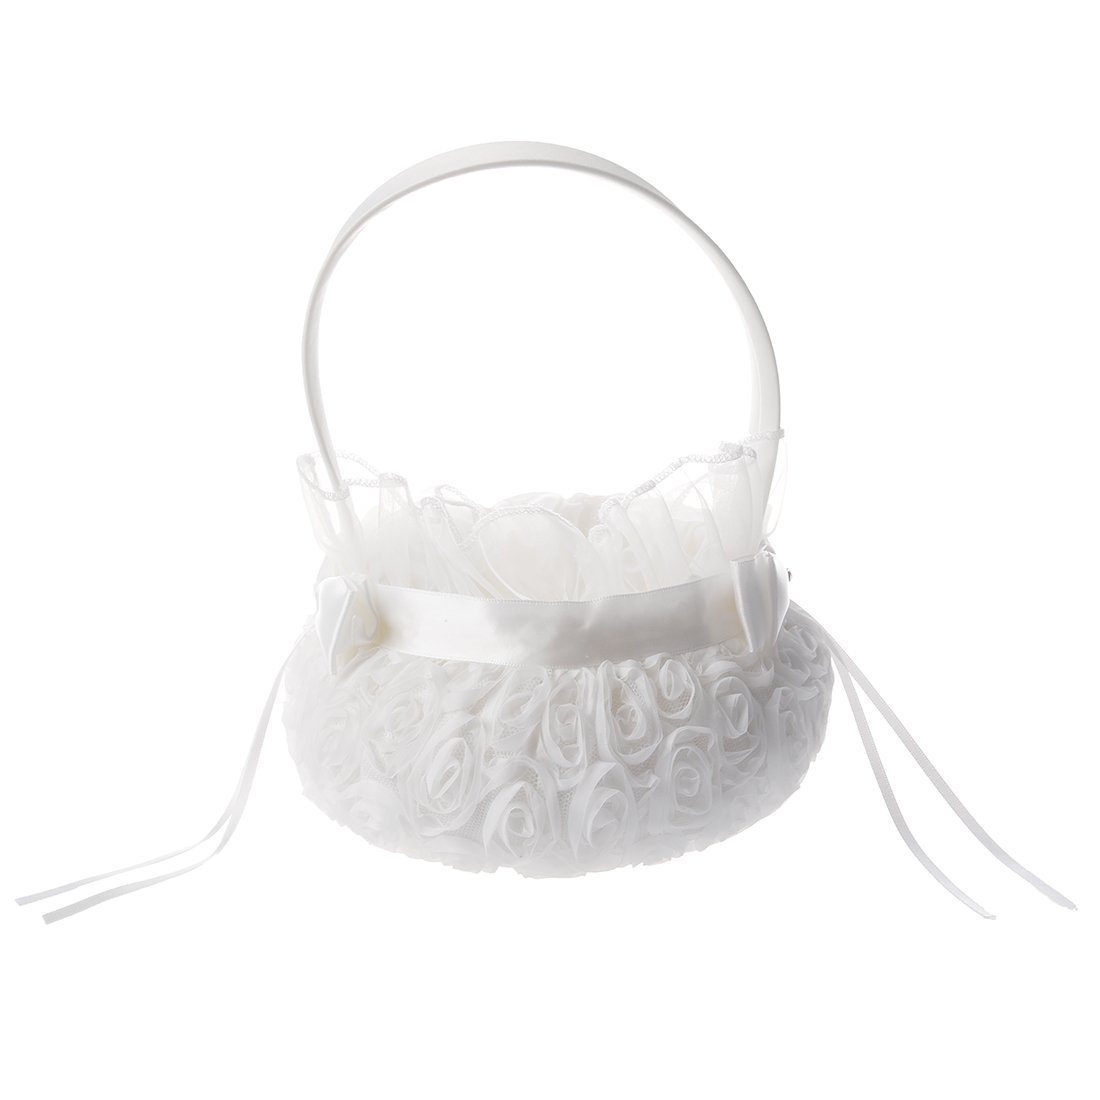 TOOGOO(R) Satin Wedding Flower Girl Basket Flower Basket (C) White